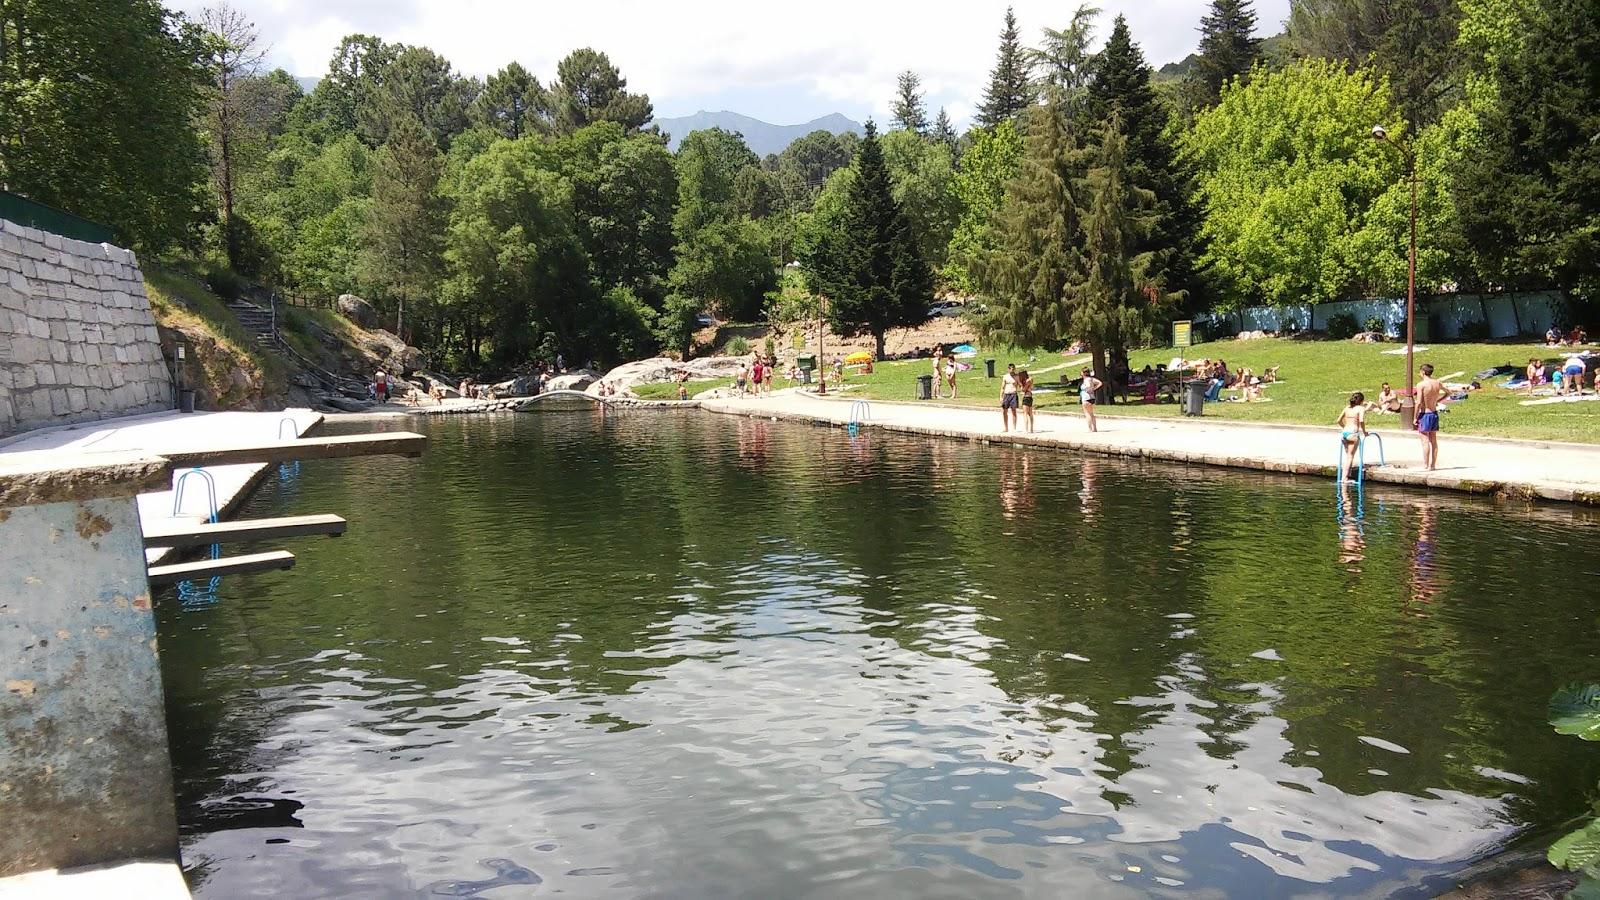 Siempre sobre ruedas ruta motera de las piscinas naturales for Piscinas naturales rio malo